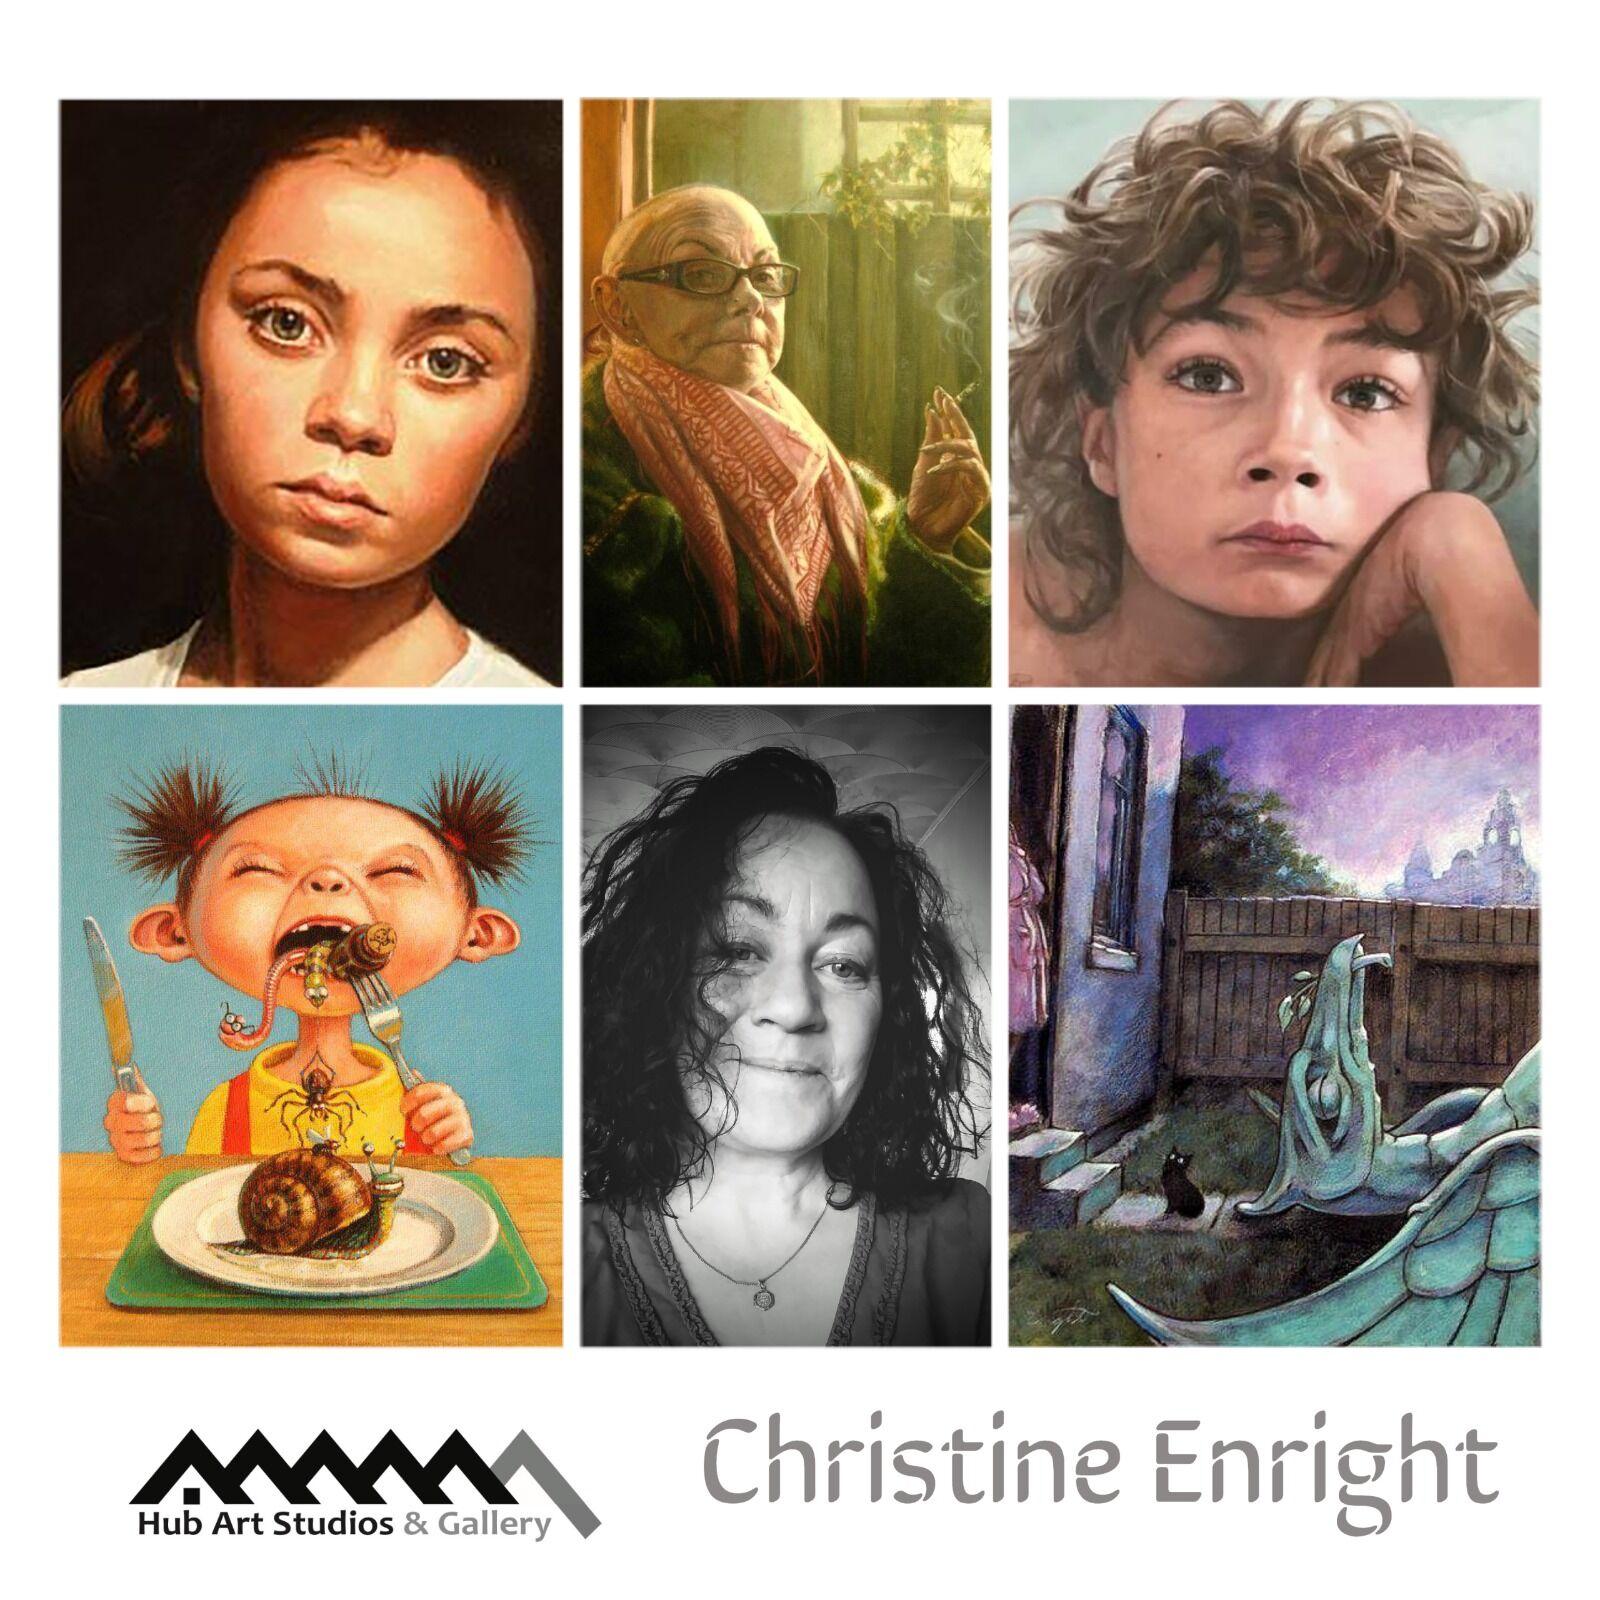 Christine Enright